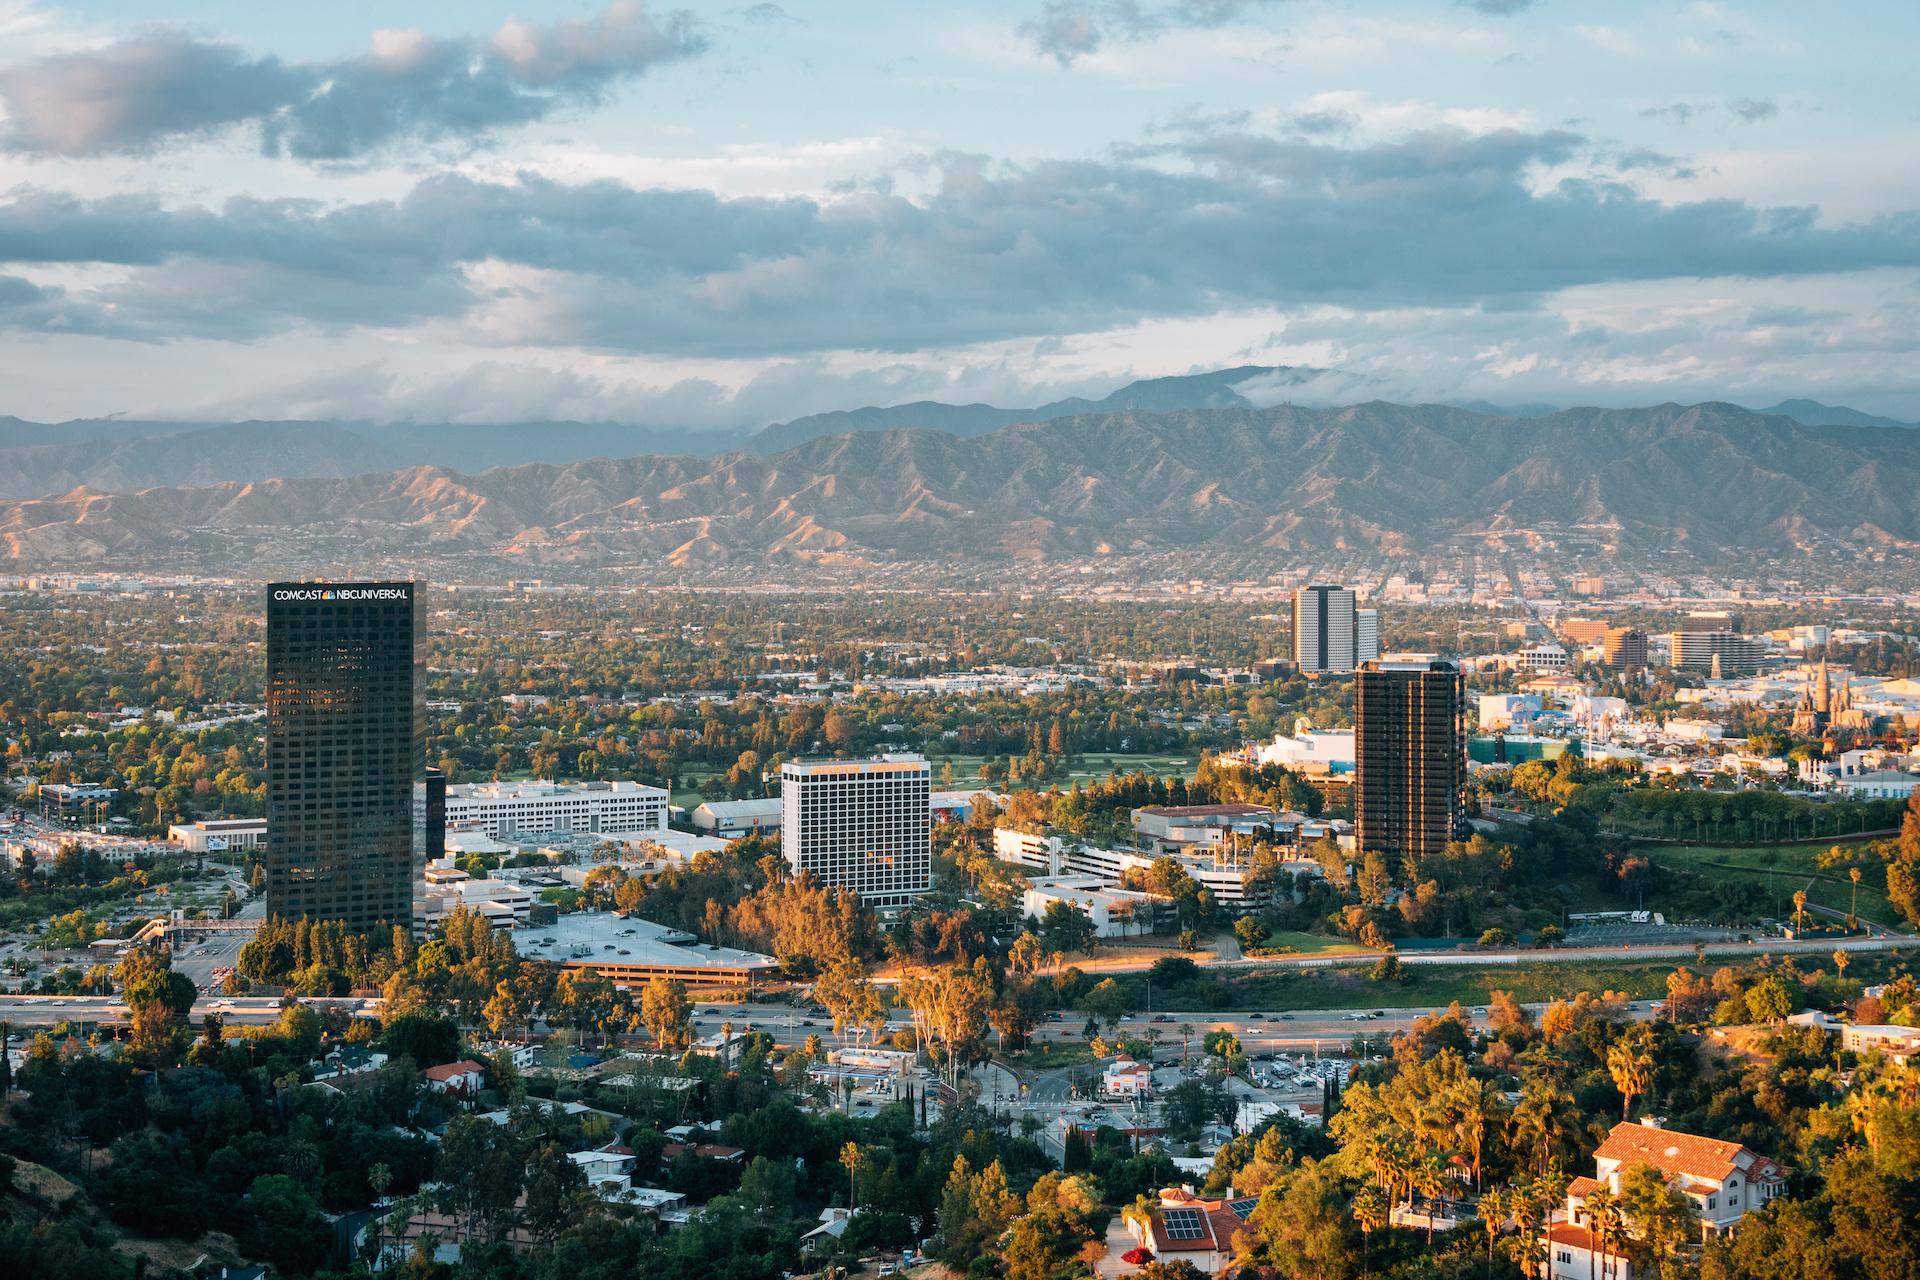 Comcast NBC building in Universal City Los Angeles